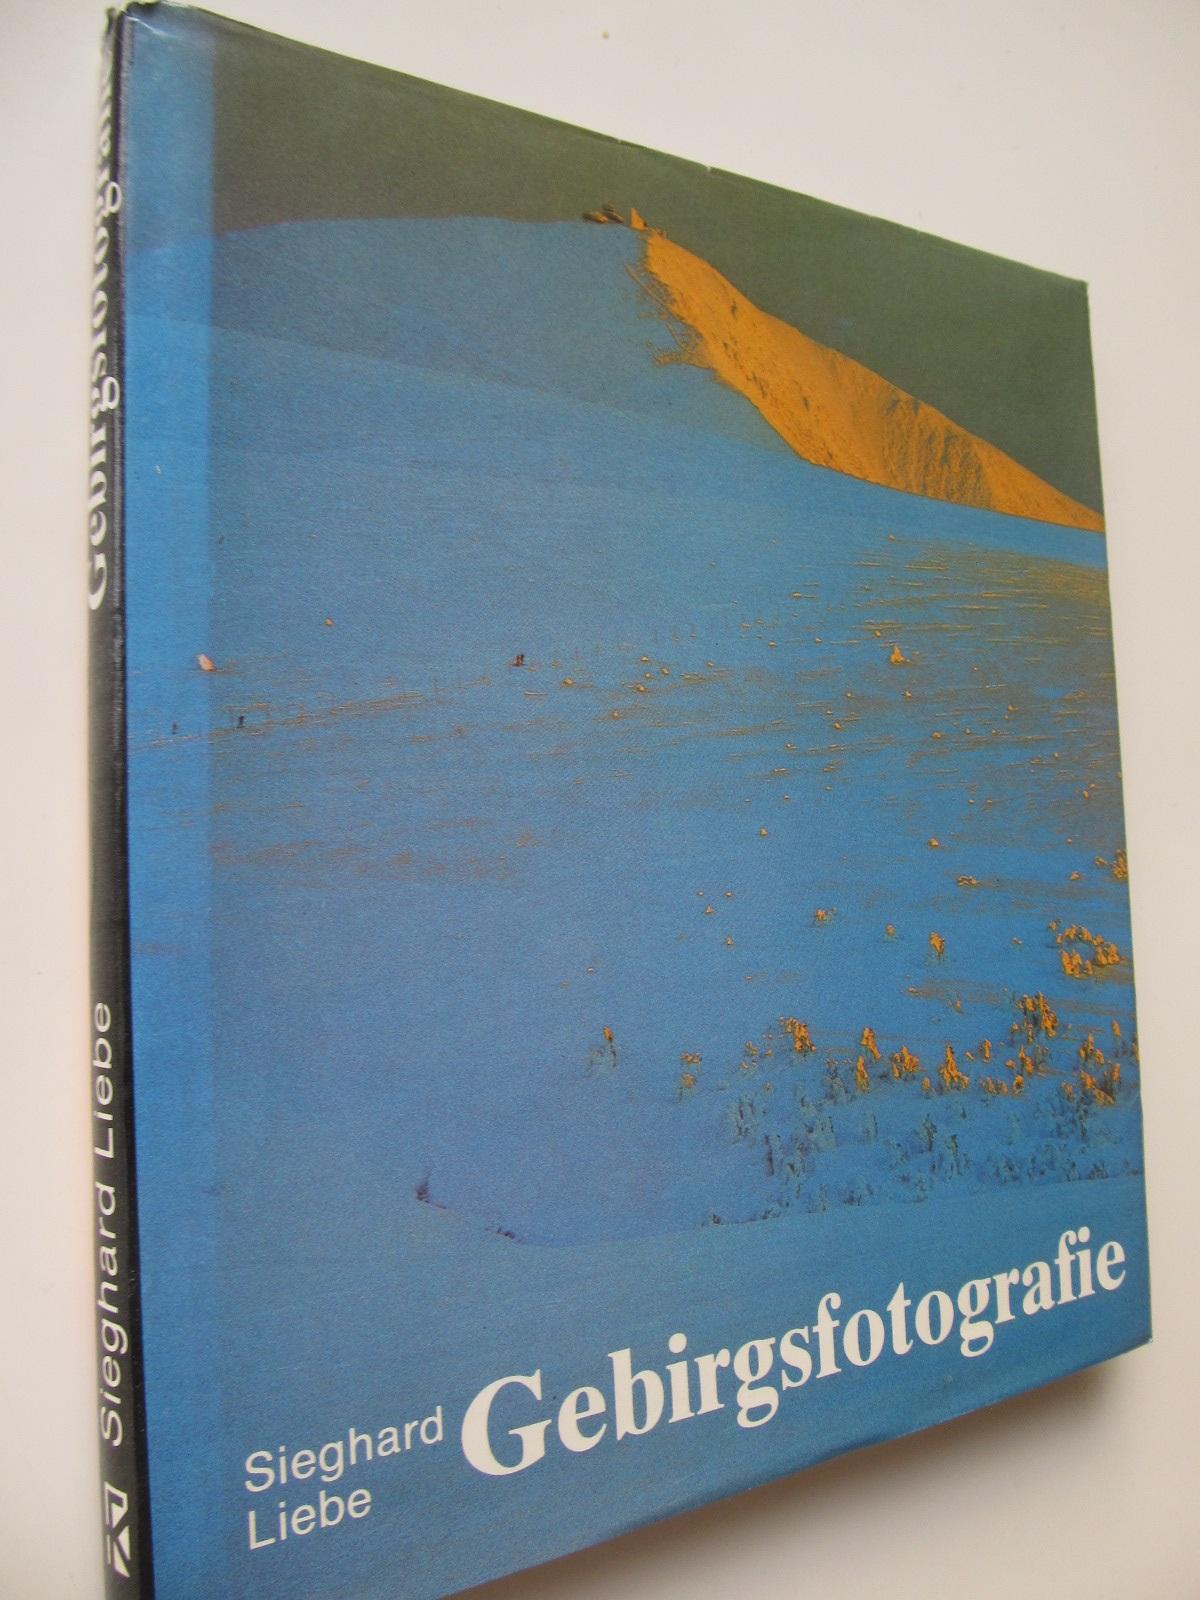 Gebirsgsfotografie (album fotografii montane) - Sieghard Liebe | Detalii carte